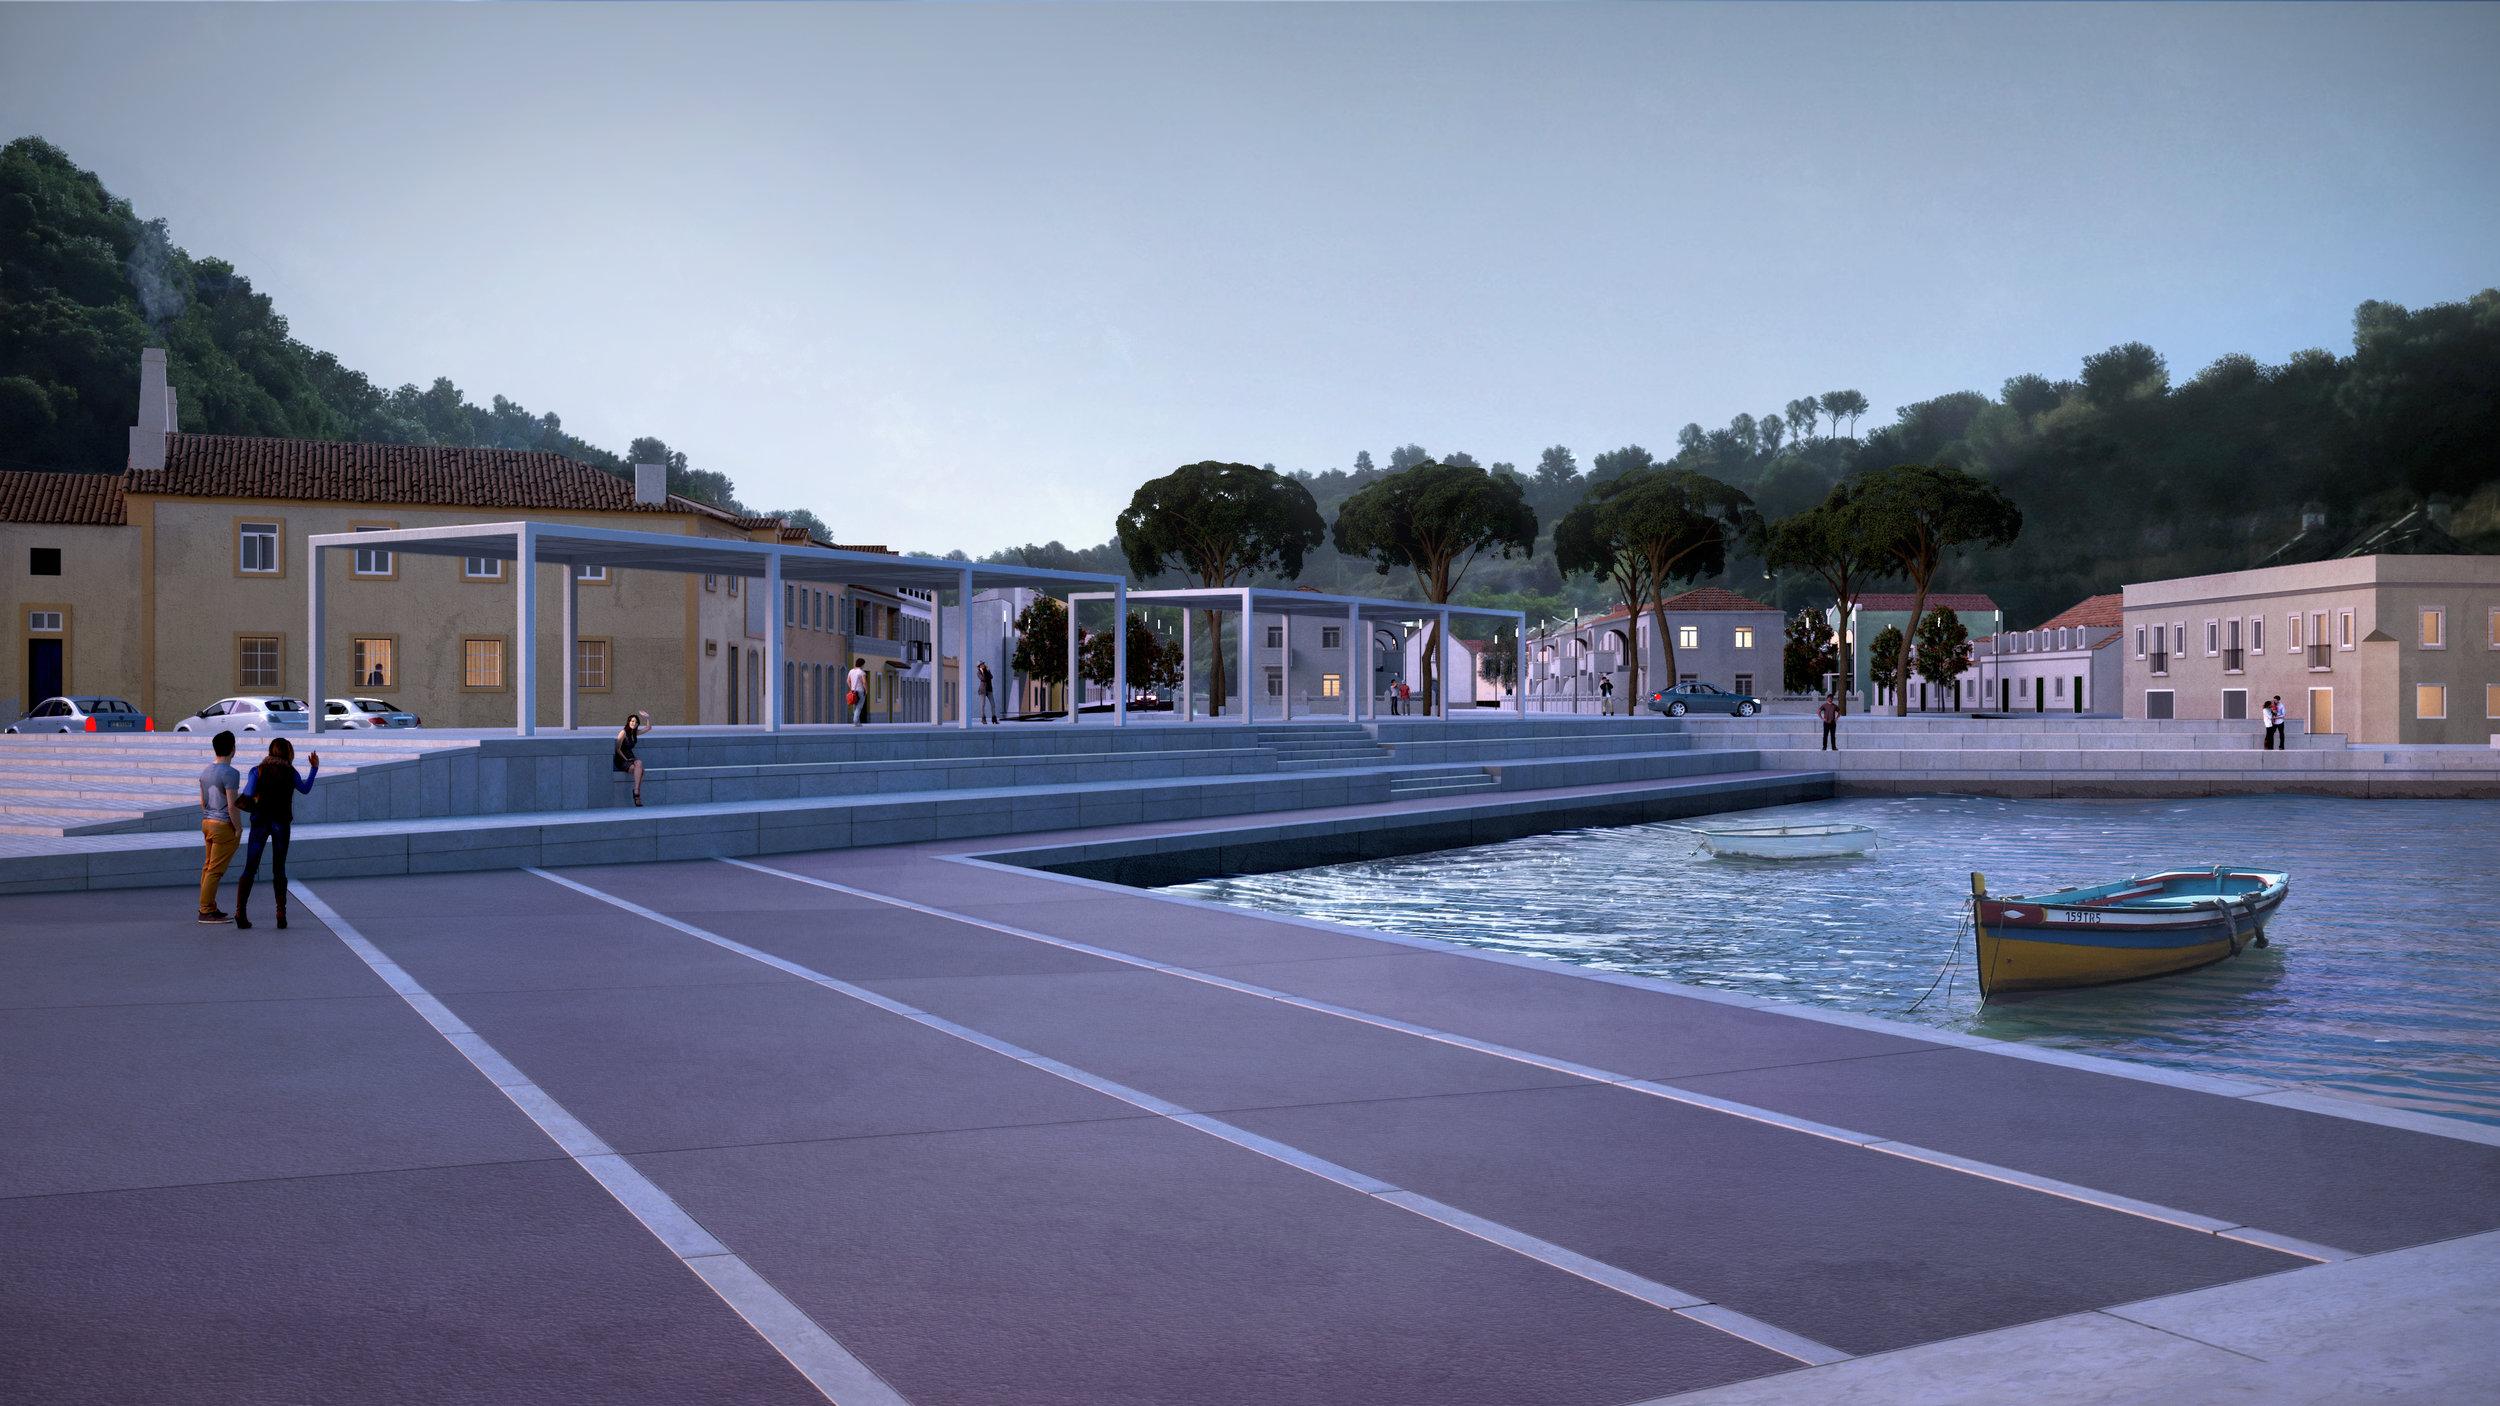 New Plan for Porto Brandão approved by Municipality of Almada